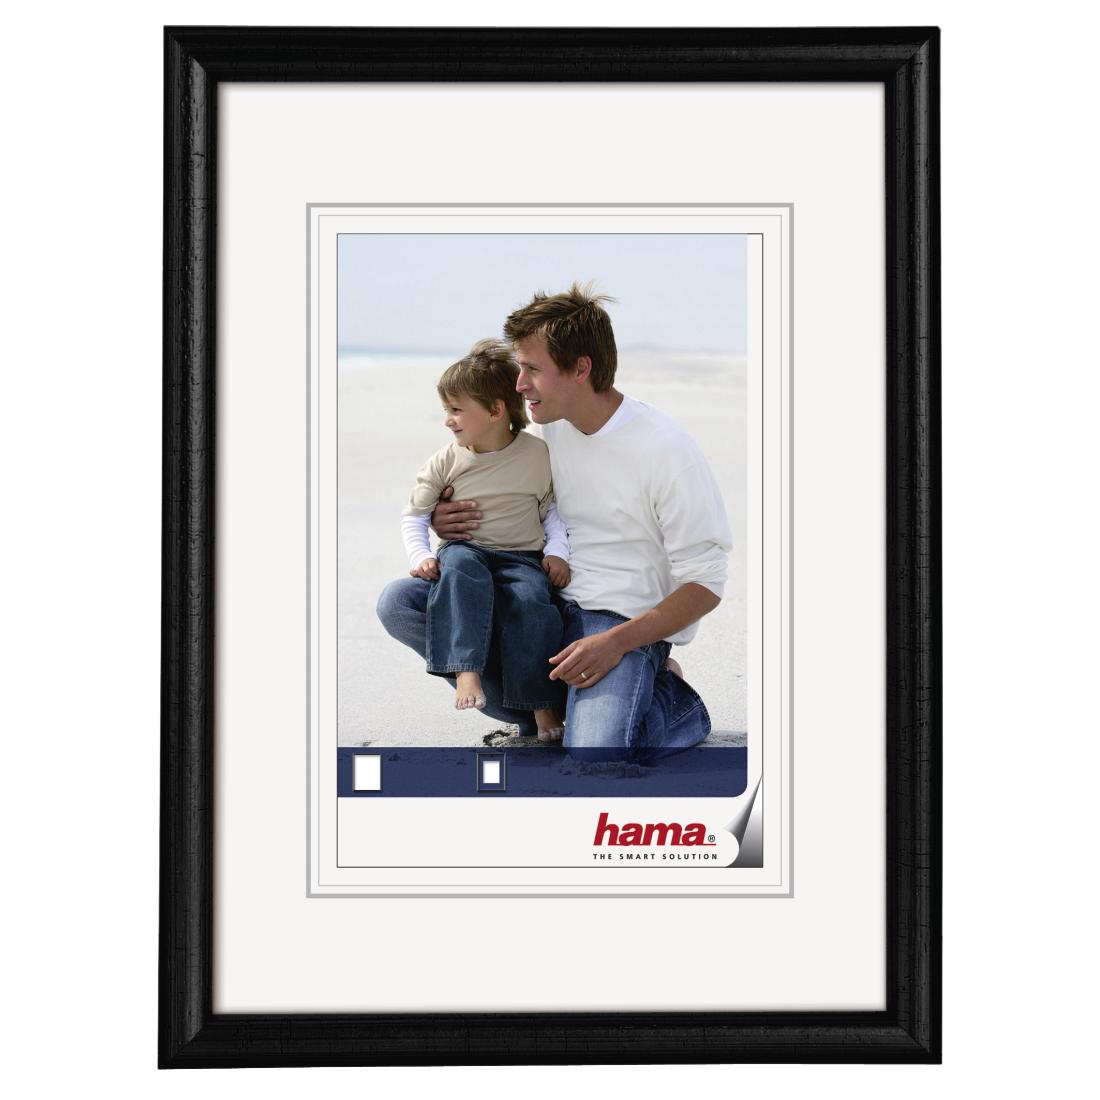 00064643 Hama Wooden Frame Oregon Black 9 X 13 Cm Hama De